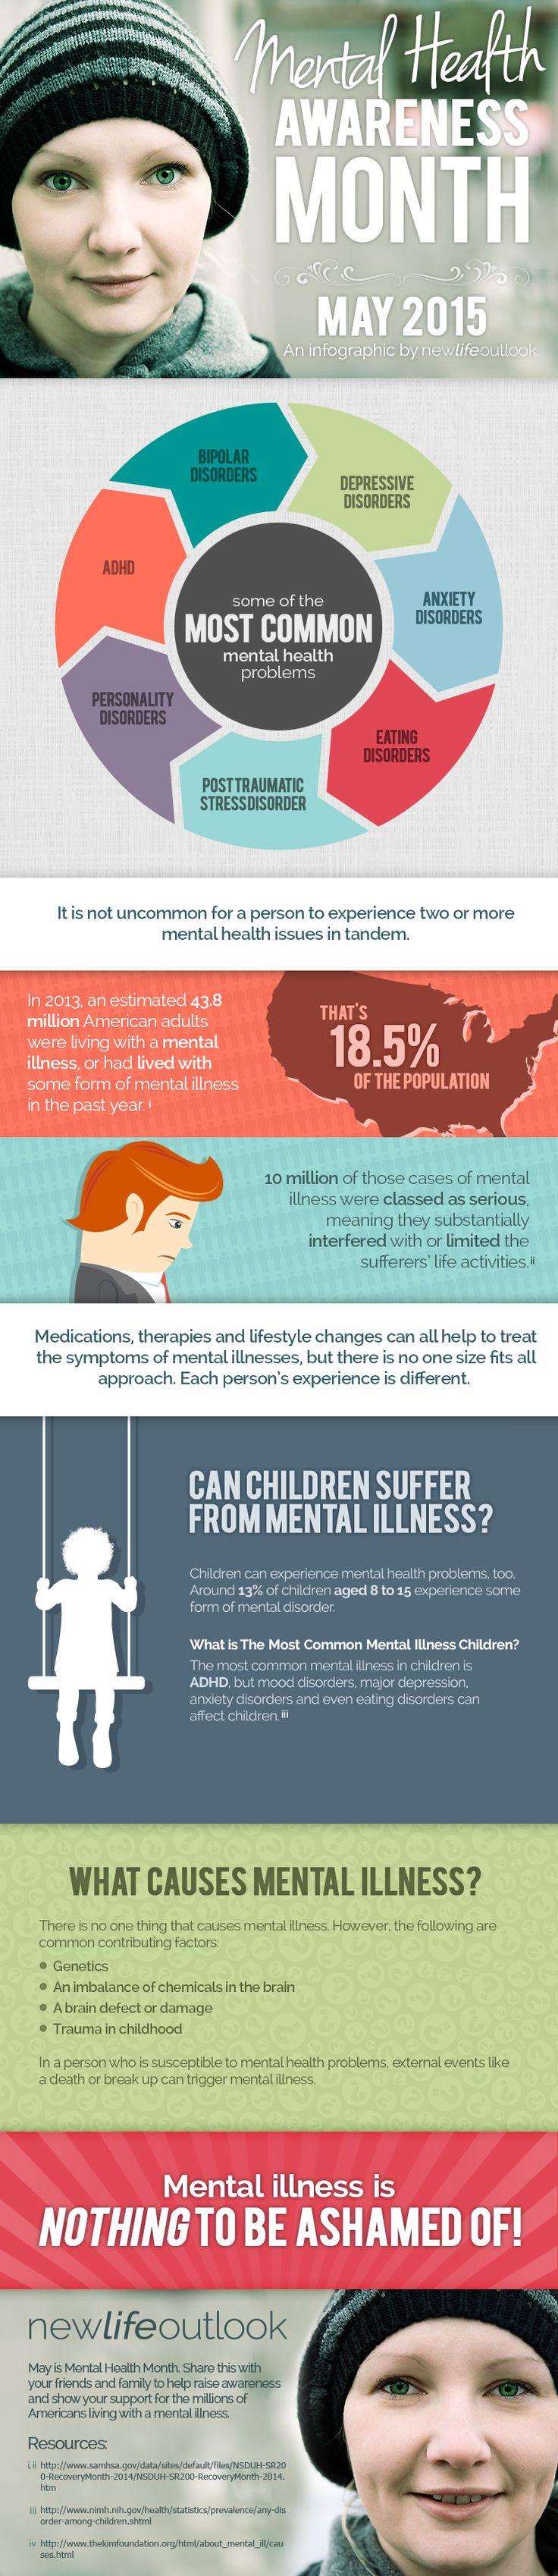 The Importance of Raising Awareness of Mental Illness